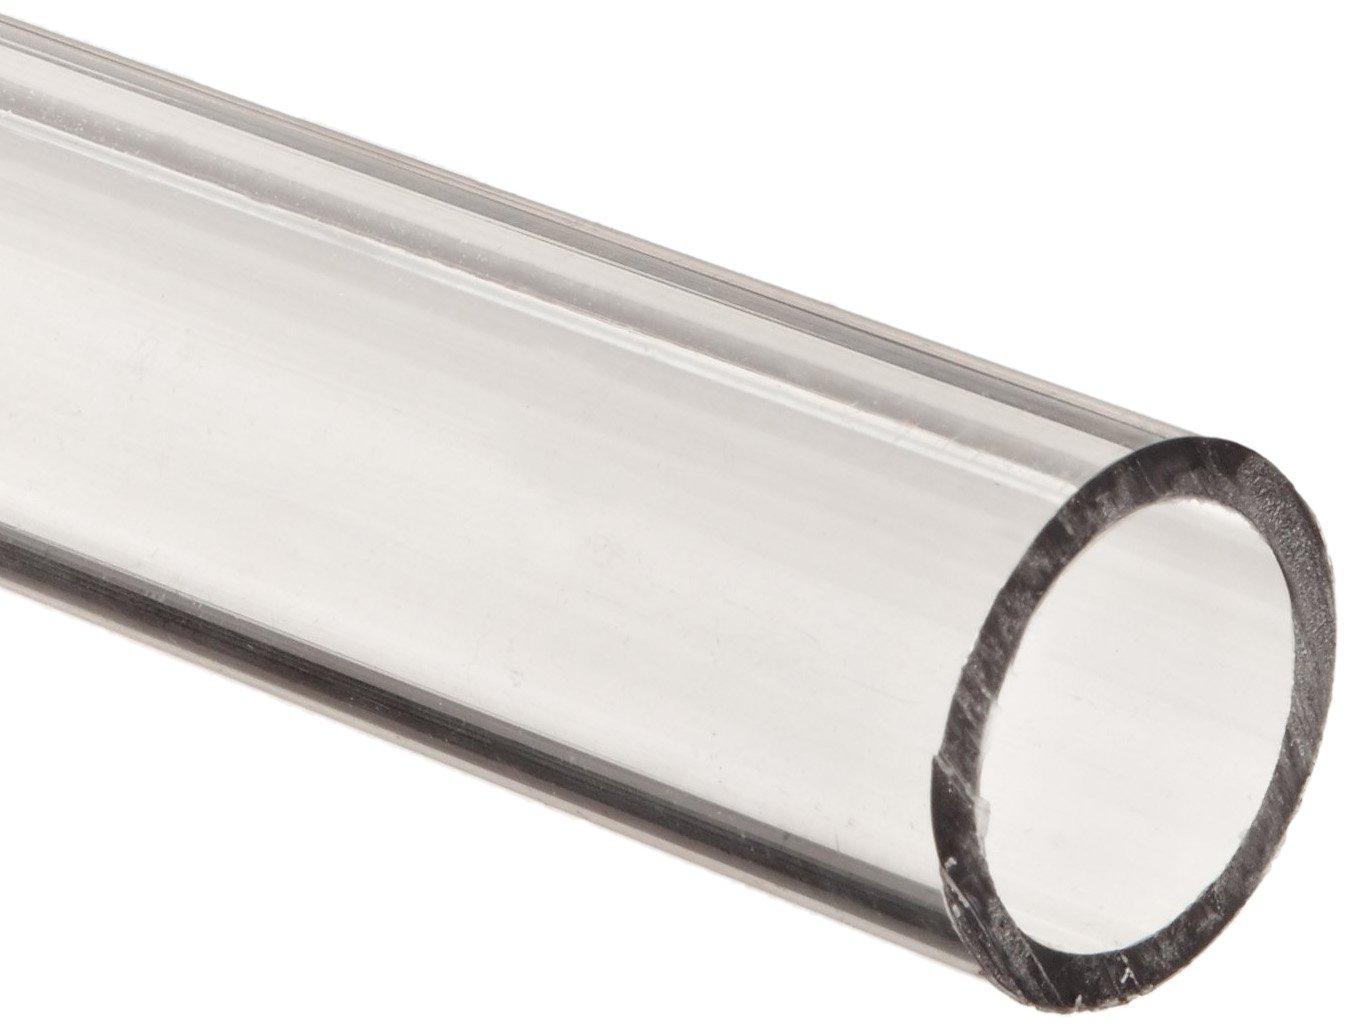 Polycarbonate Tubing, 1' ID x 1 1/4' OD x 1/8' Wall, Clear Color 24' L 1 ID x 1 1/4 OD x 1/8 Wall Clear Color 24 L Small Parts